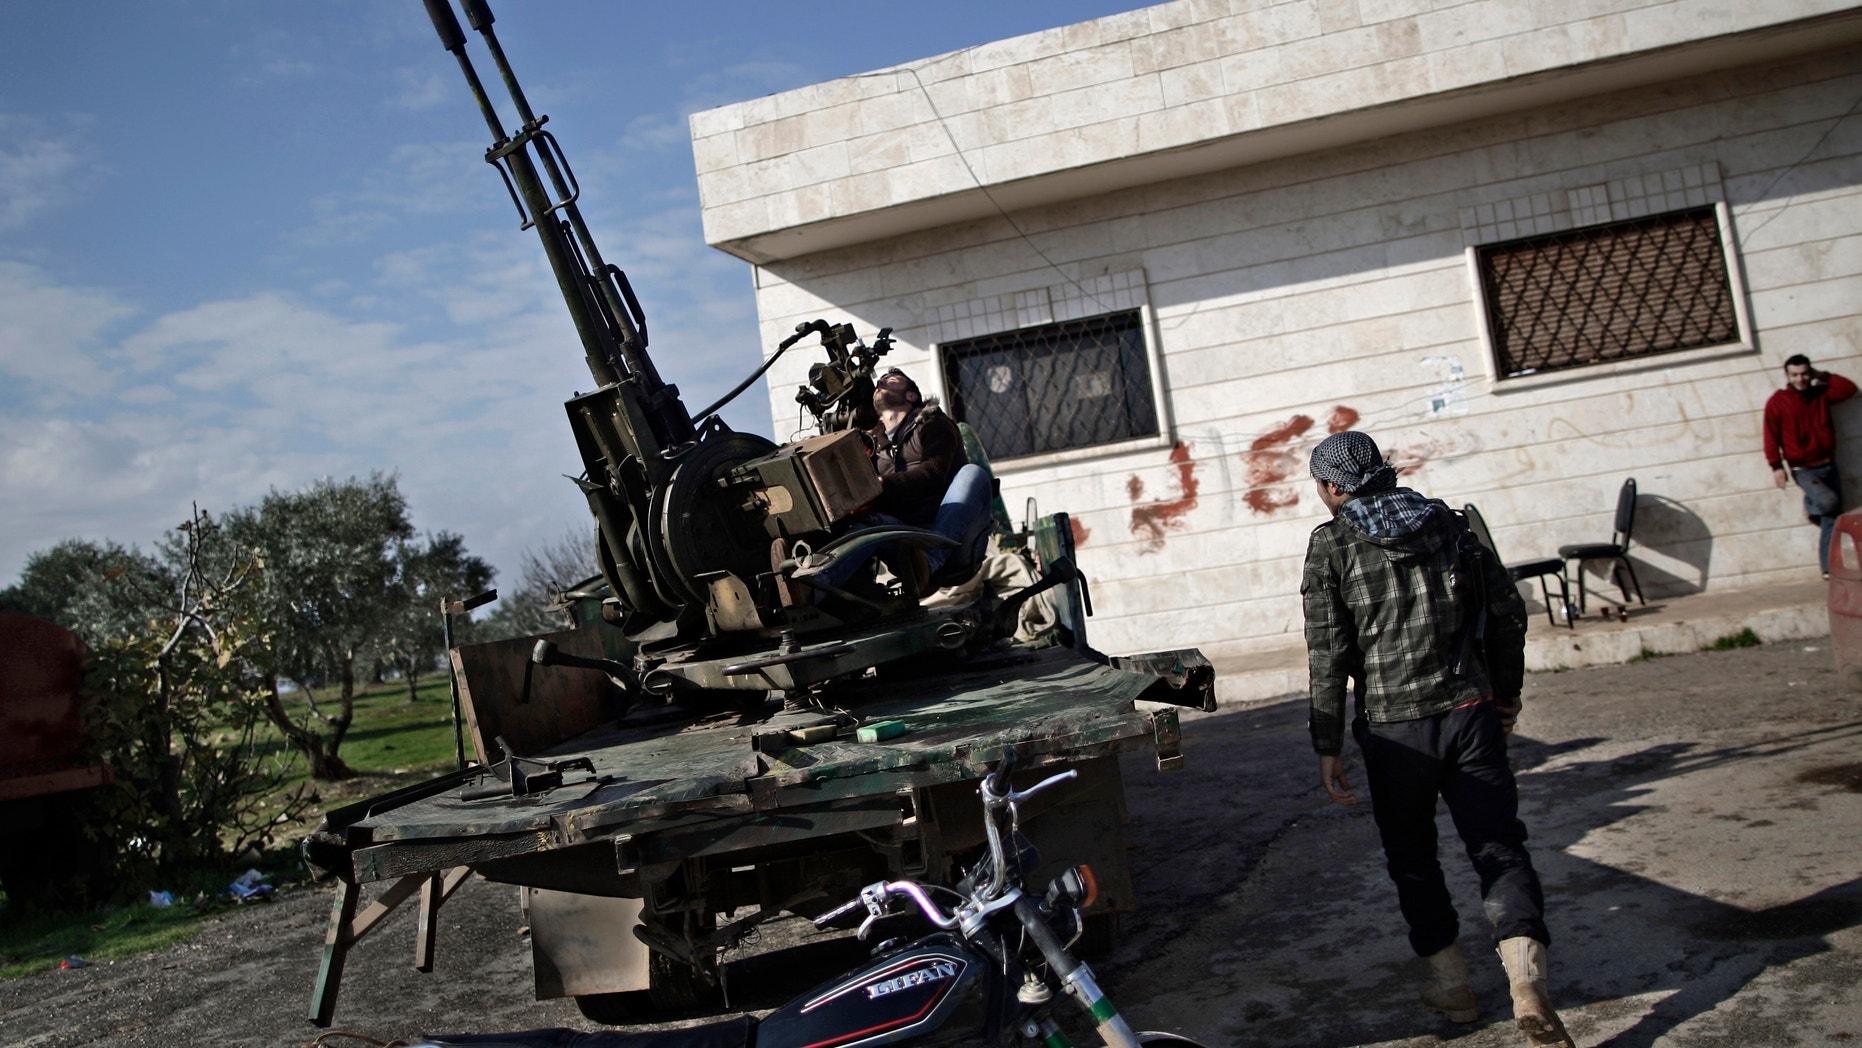 Dec. 14, 2012 - Syrian rebel checks an anti-aircraft weapon, in Maaret Misreen, near Idlib, Syria.